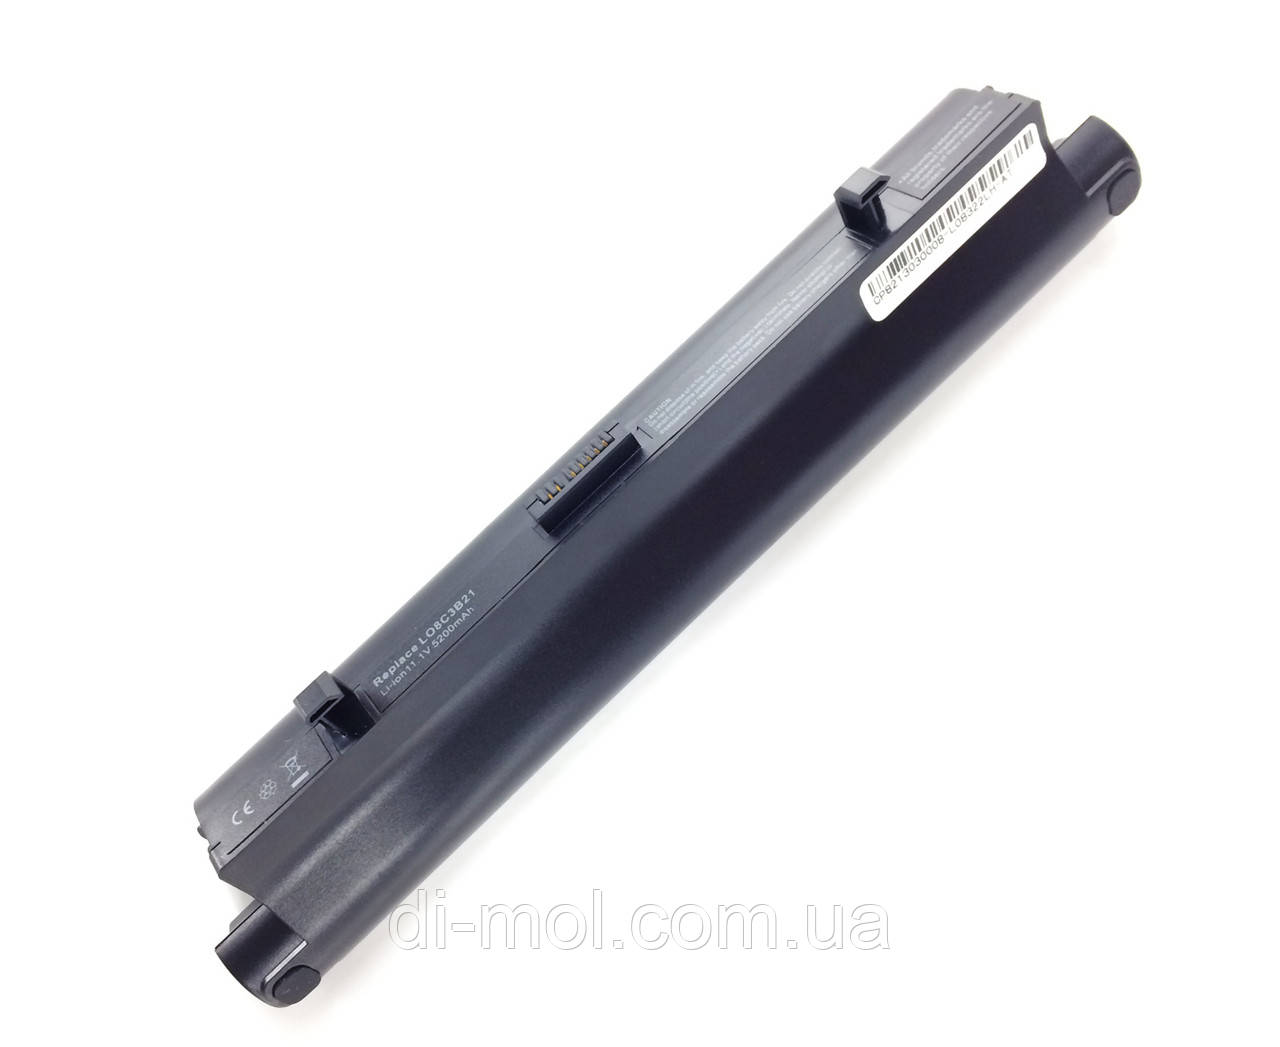 Аккумуляторная батарея Lenovo IdeaPad S9, S9e, S10, S10e, S12 series 5200mAh black 11.1